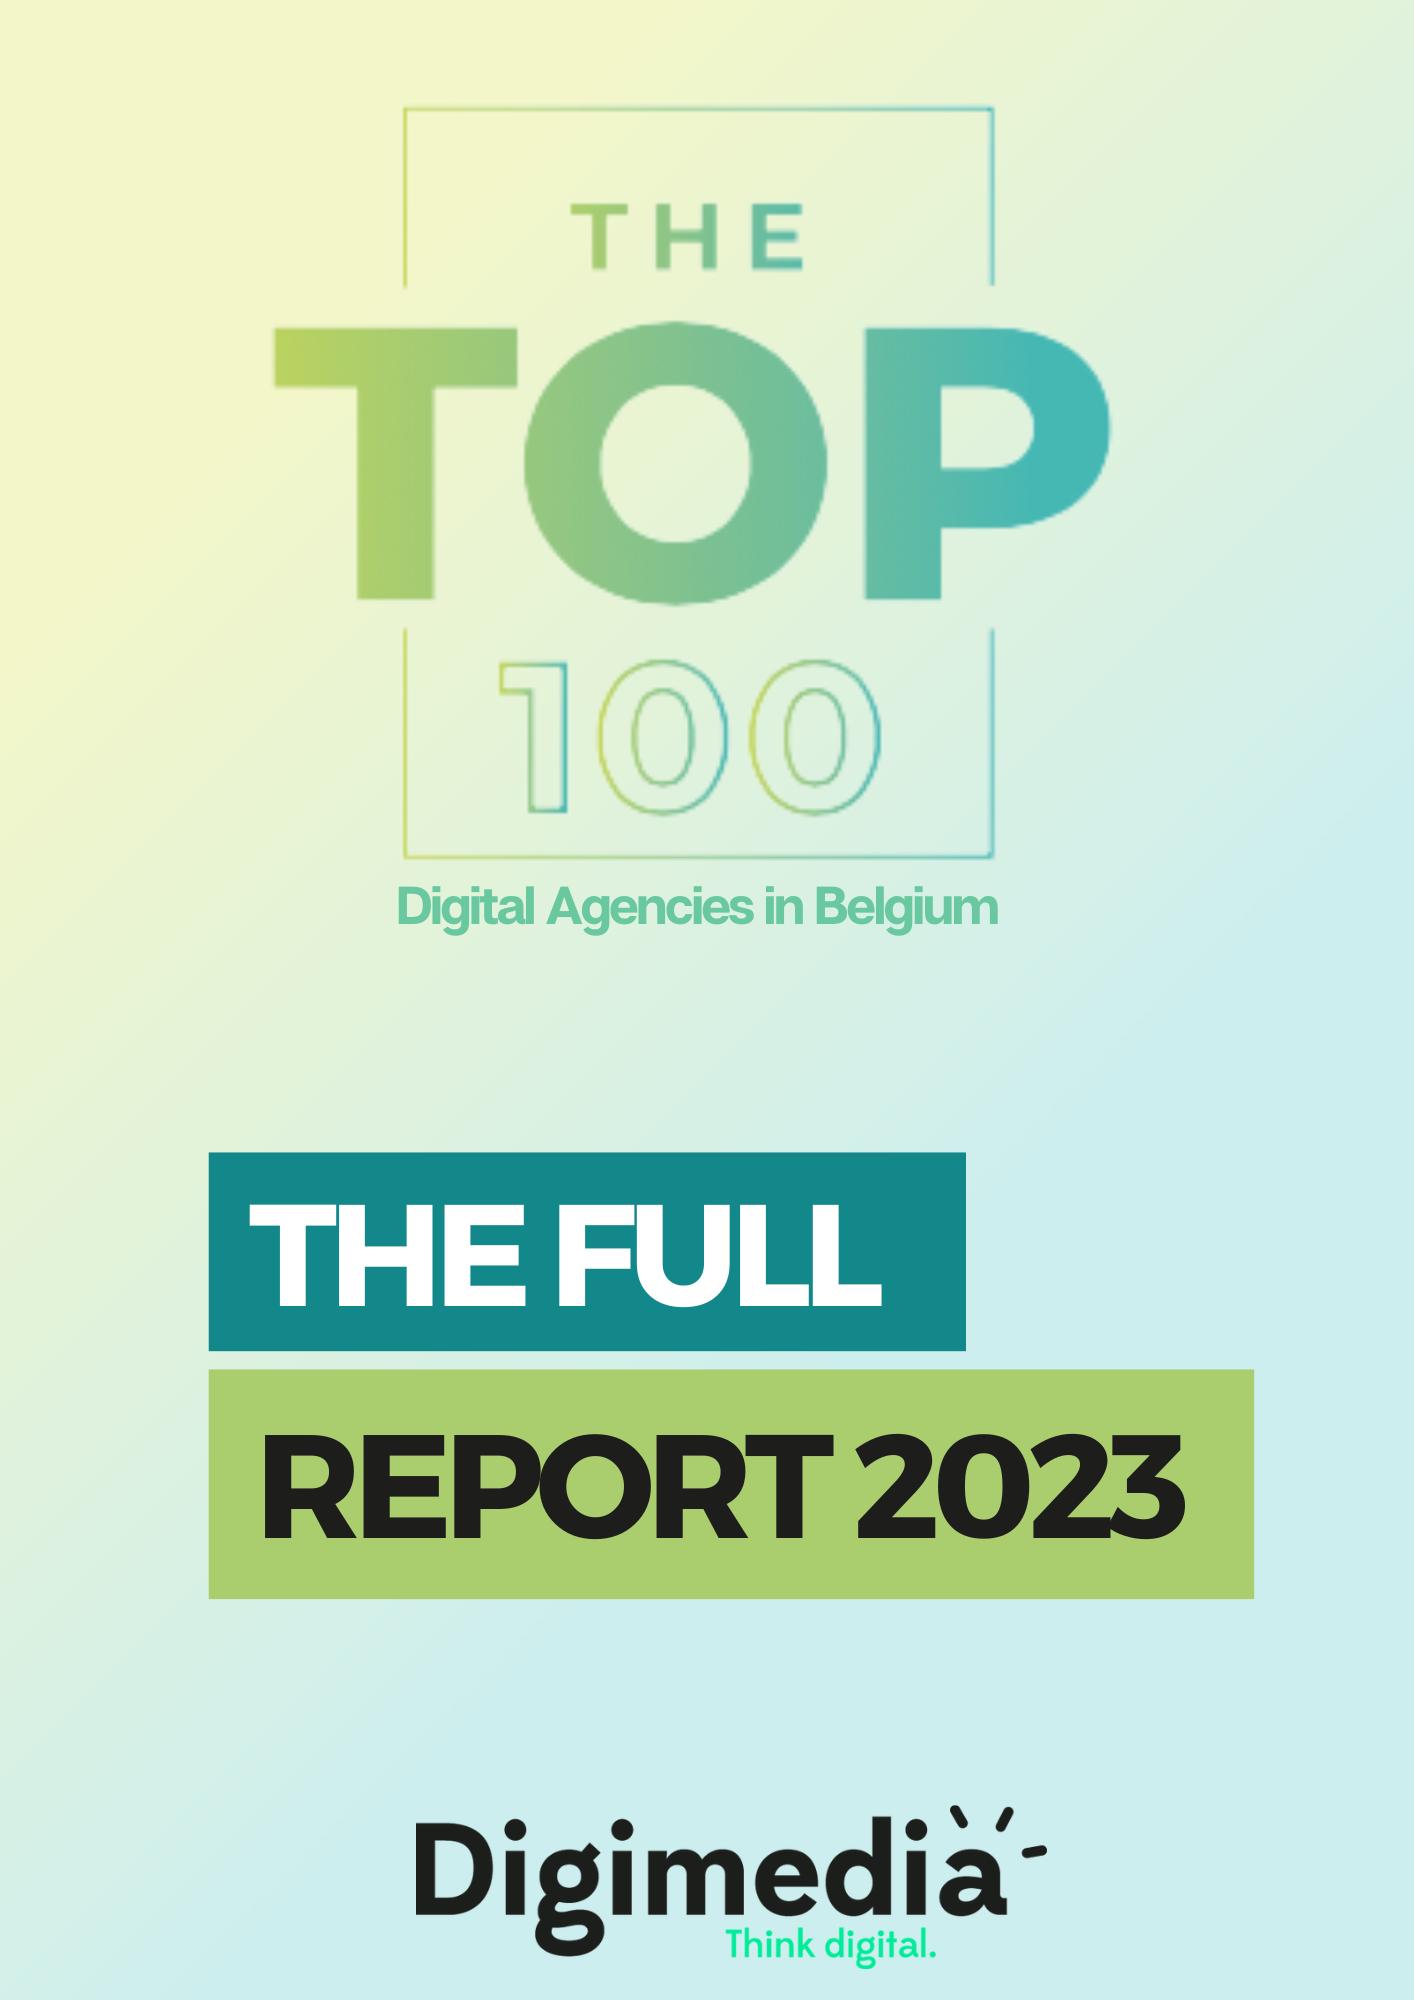 FULL REPORT 2020